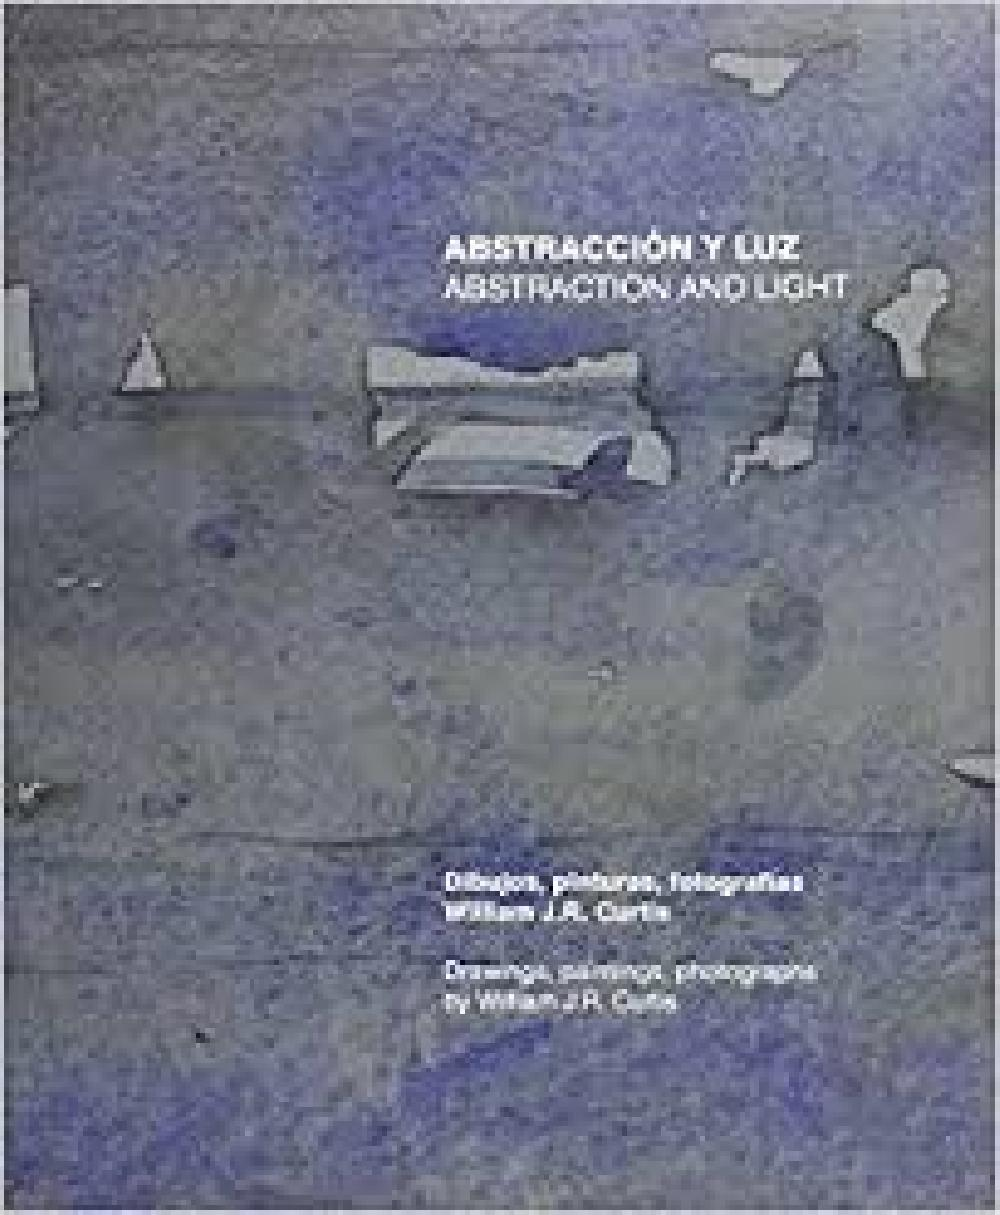 Abstraccion y luz, Abstraction and light